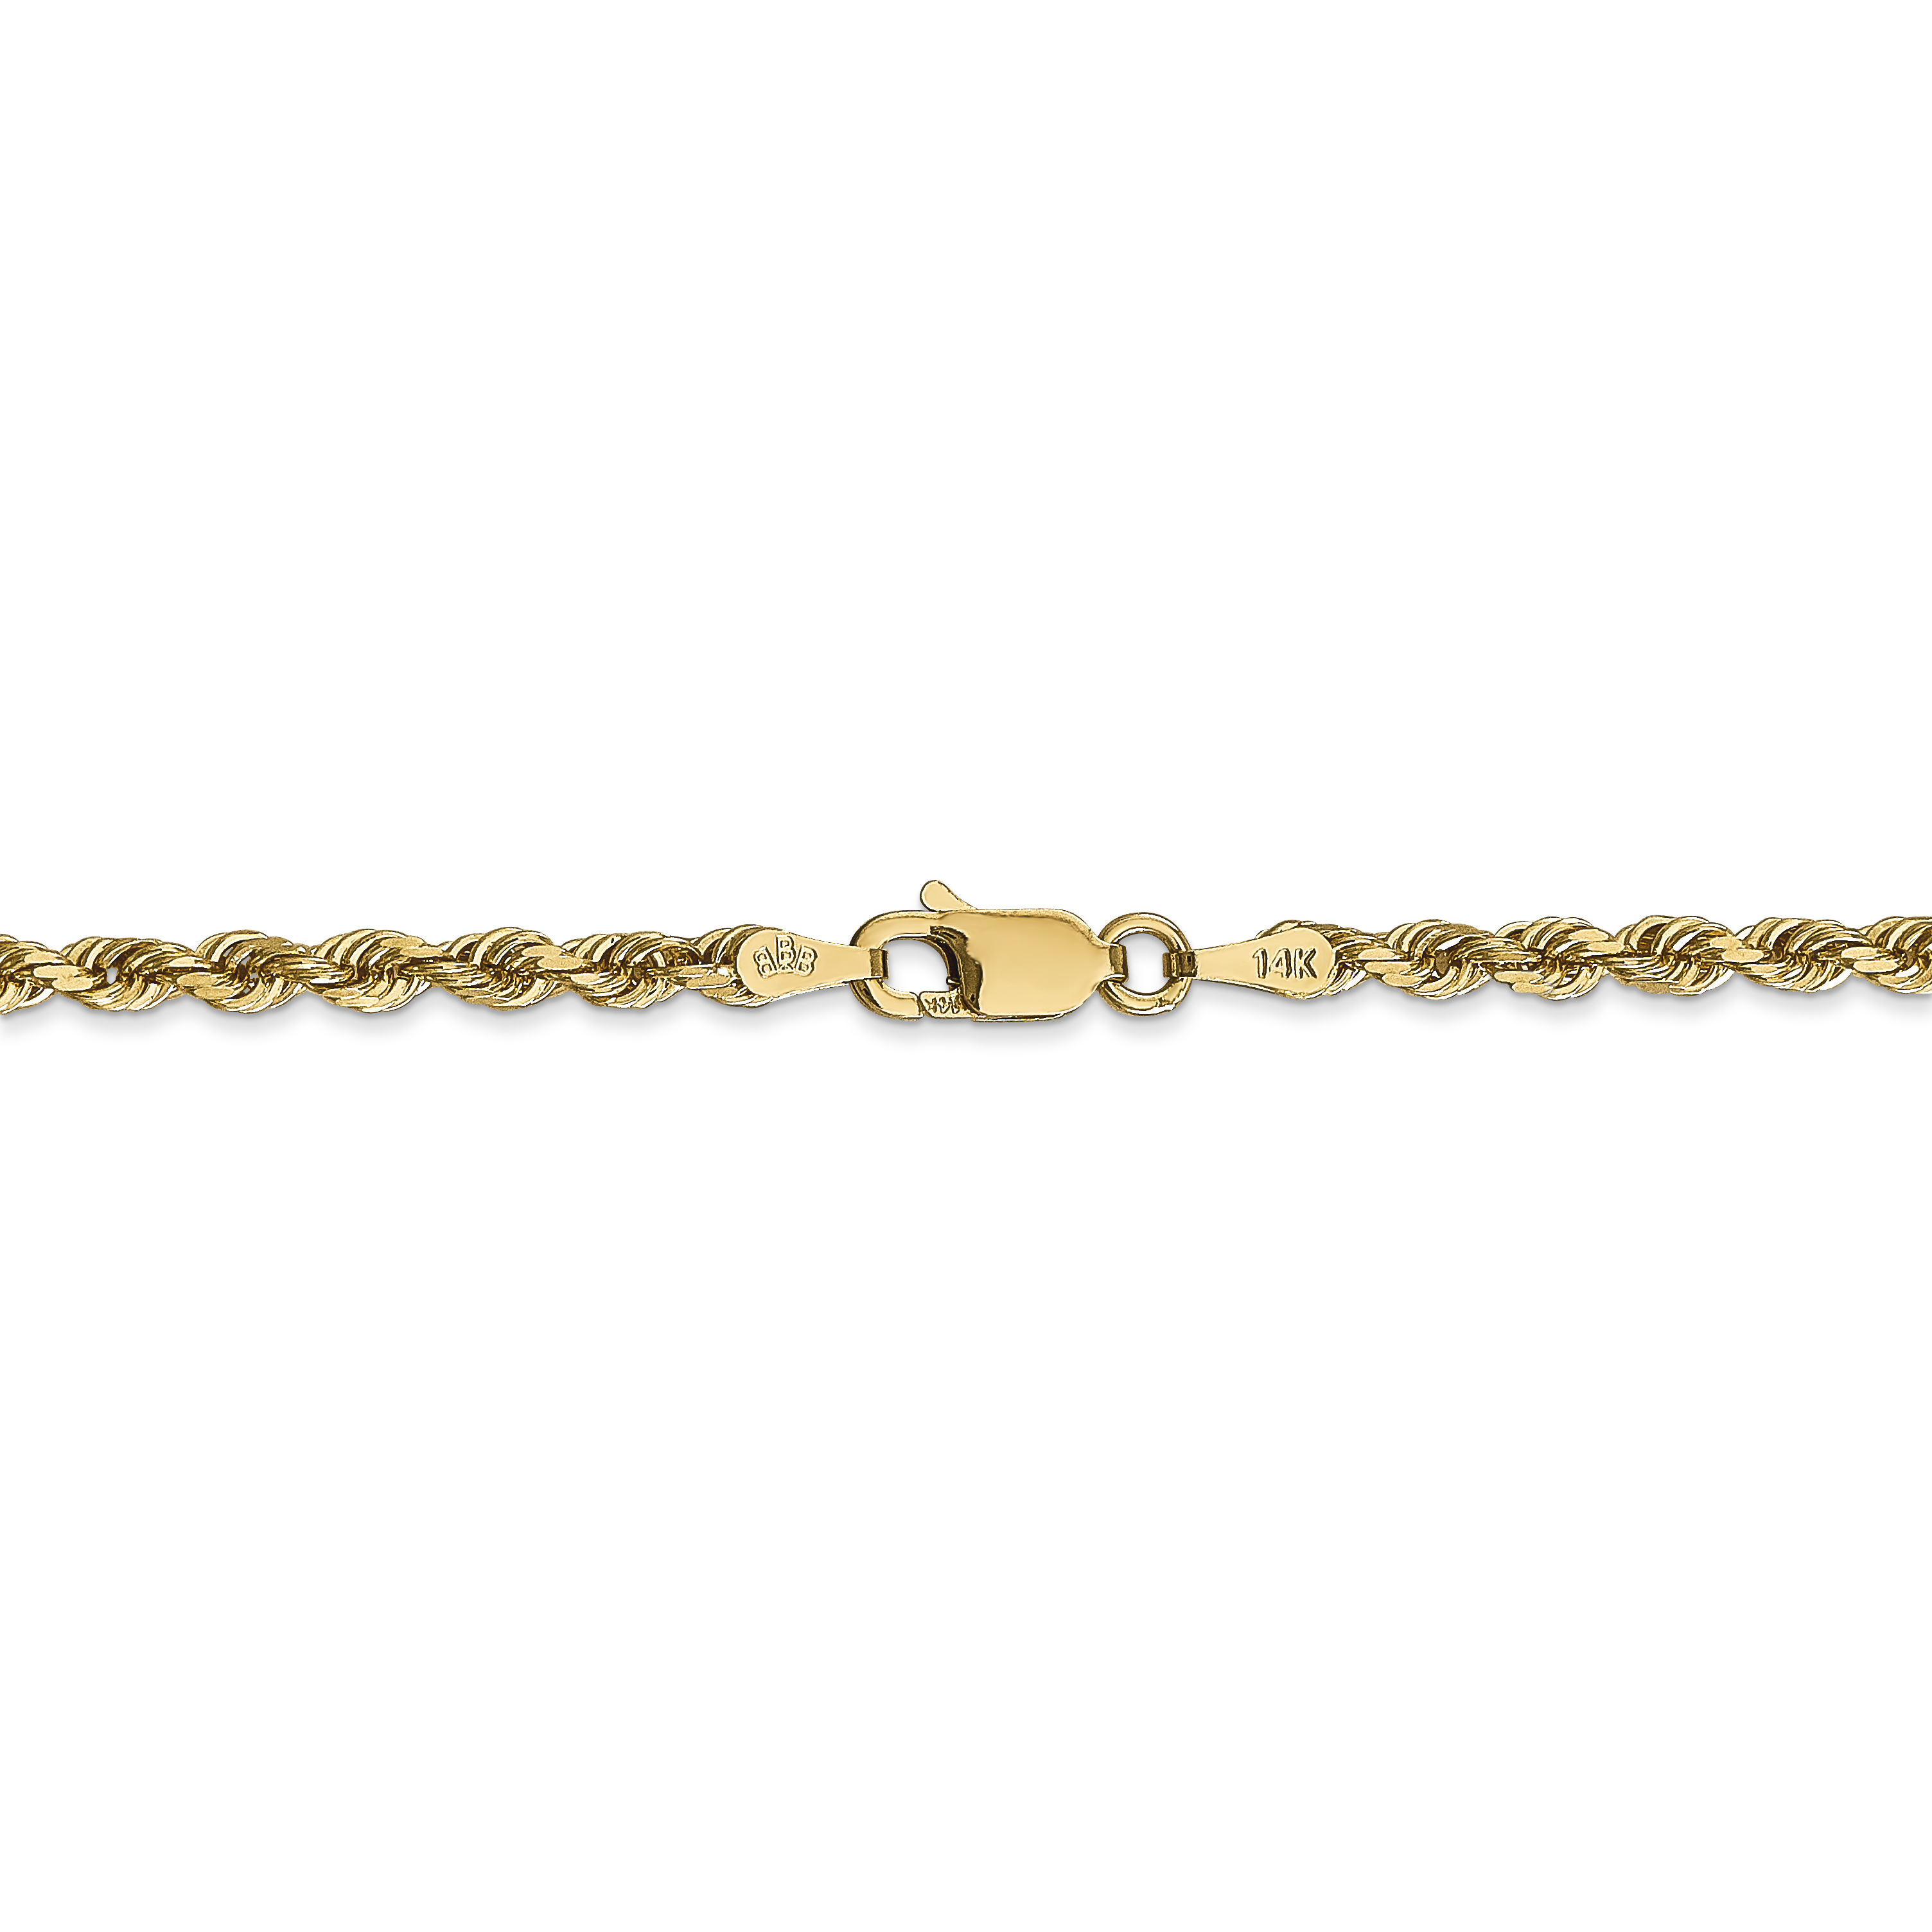 14K Yellow Gold 3.0mm Diamond Cut Quadruple Rope Chain 24 Inch - image 1 of 5